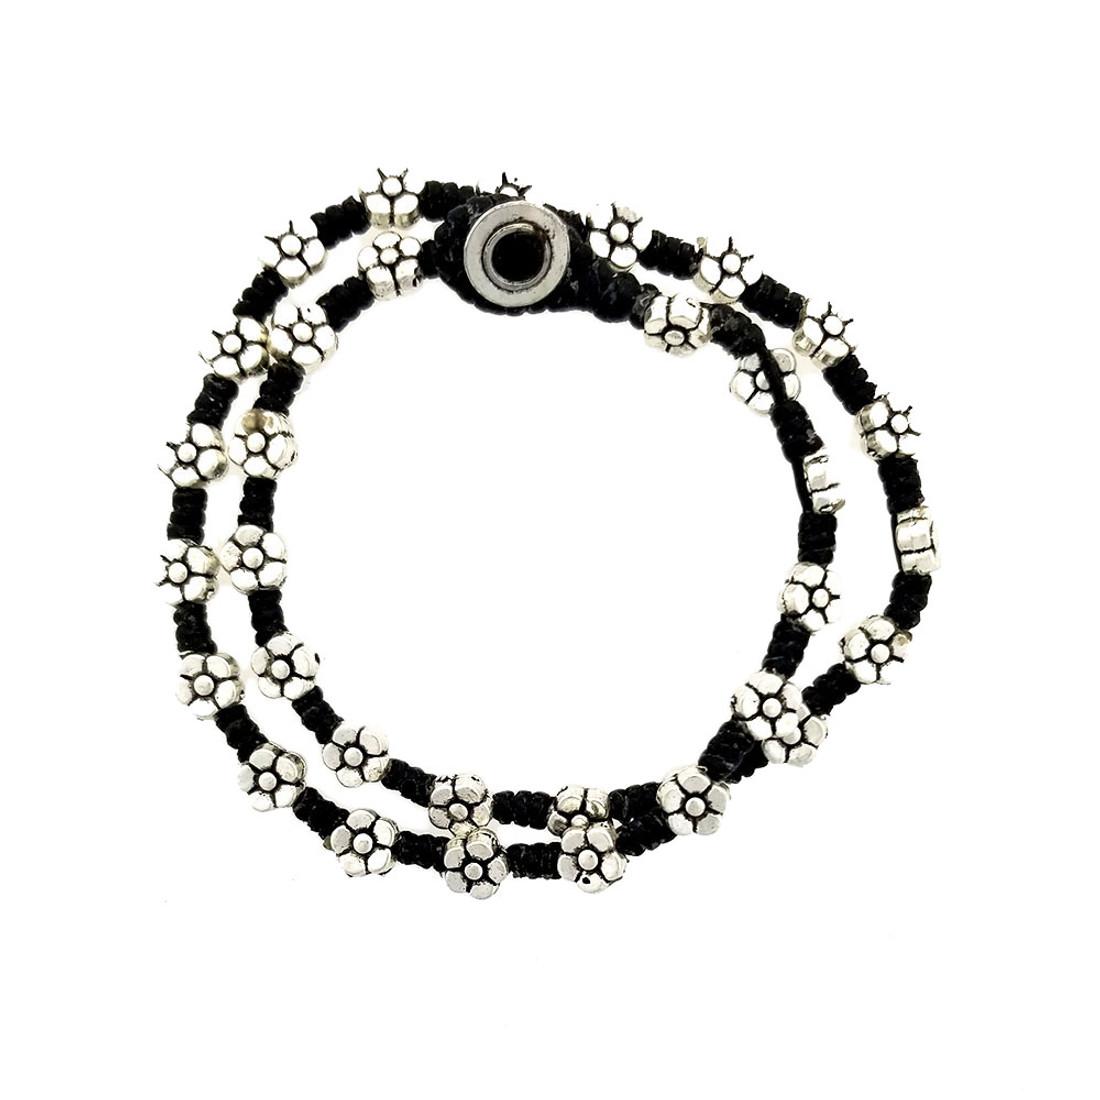 Flower alloy beaded wrap bracelet or choker necklace.